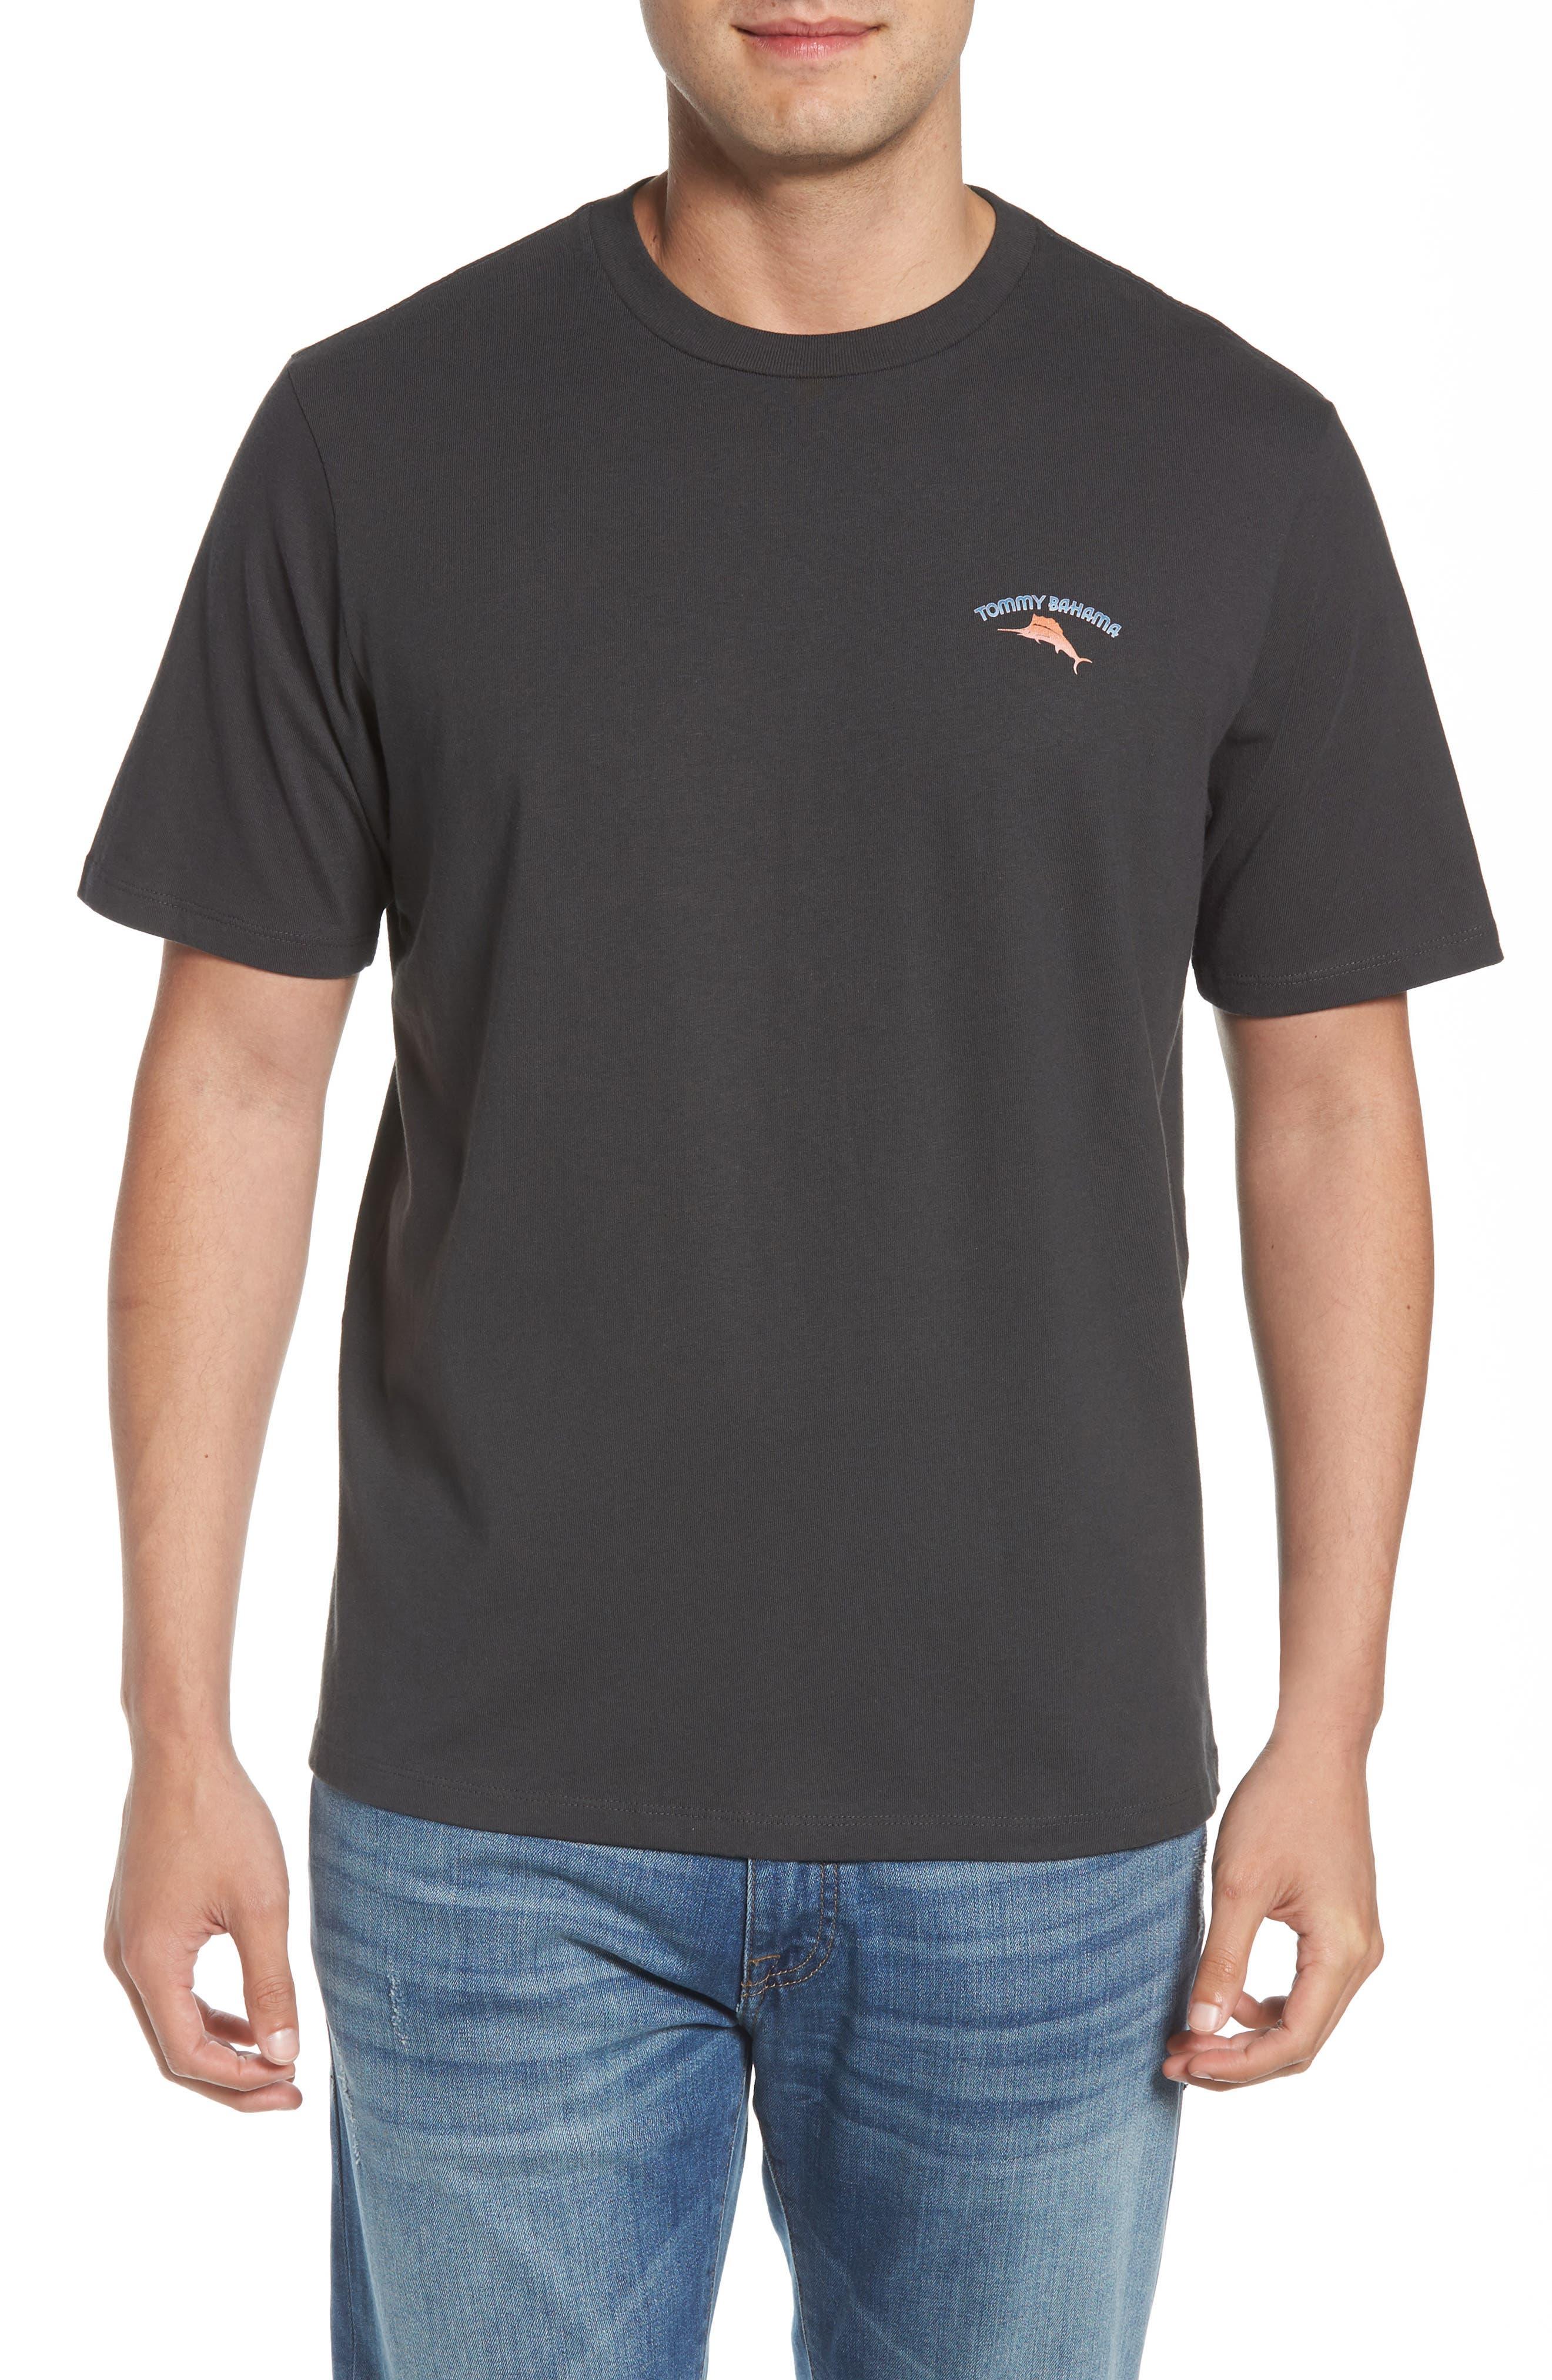 Bromingos T-Shirt,                         Main,                         color,